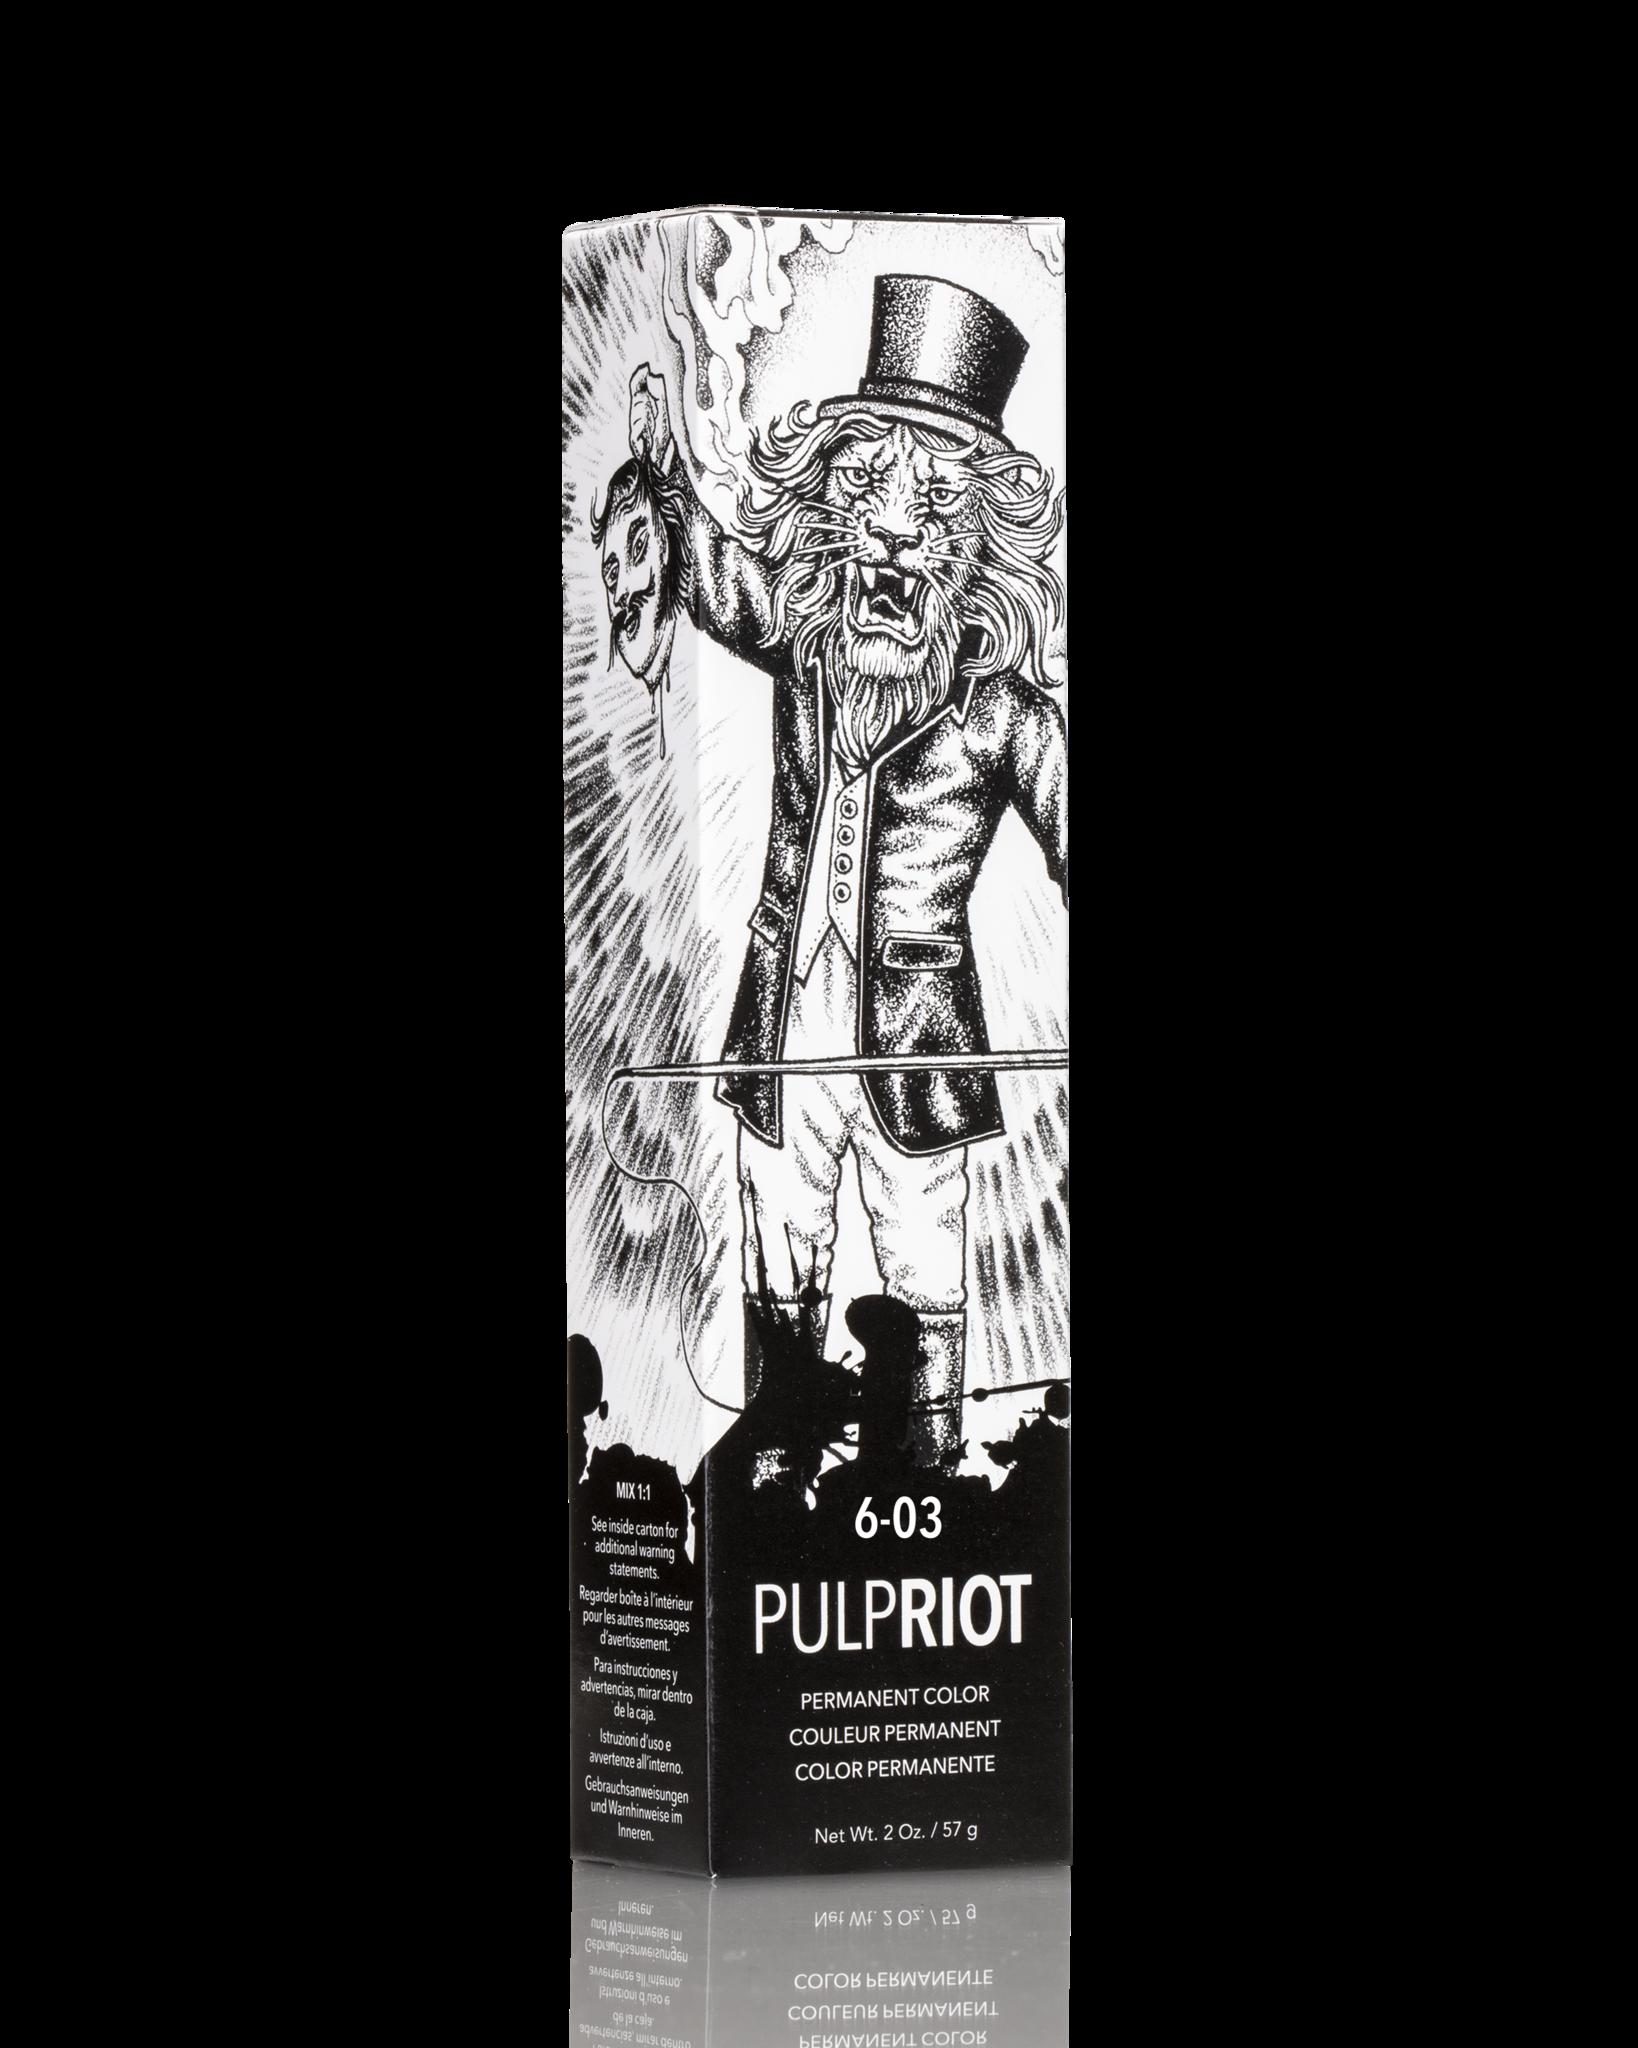 Pulp Riot PULP RIOT FACTION 8 NATUREL DORÉ/NATUREL GOLD 6-03